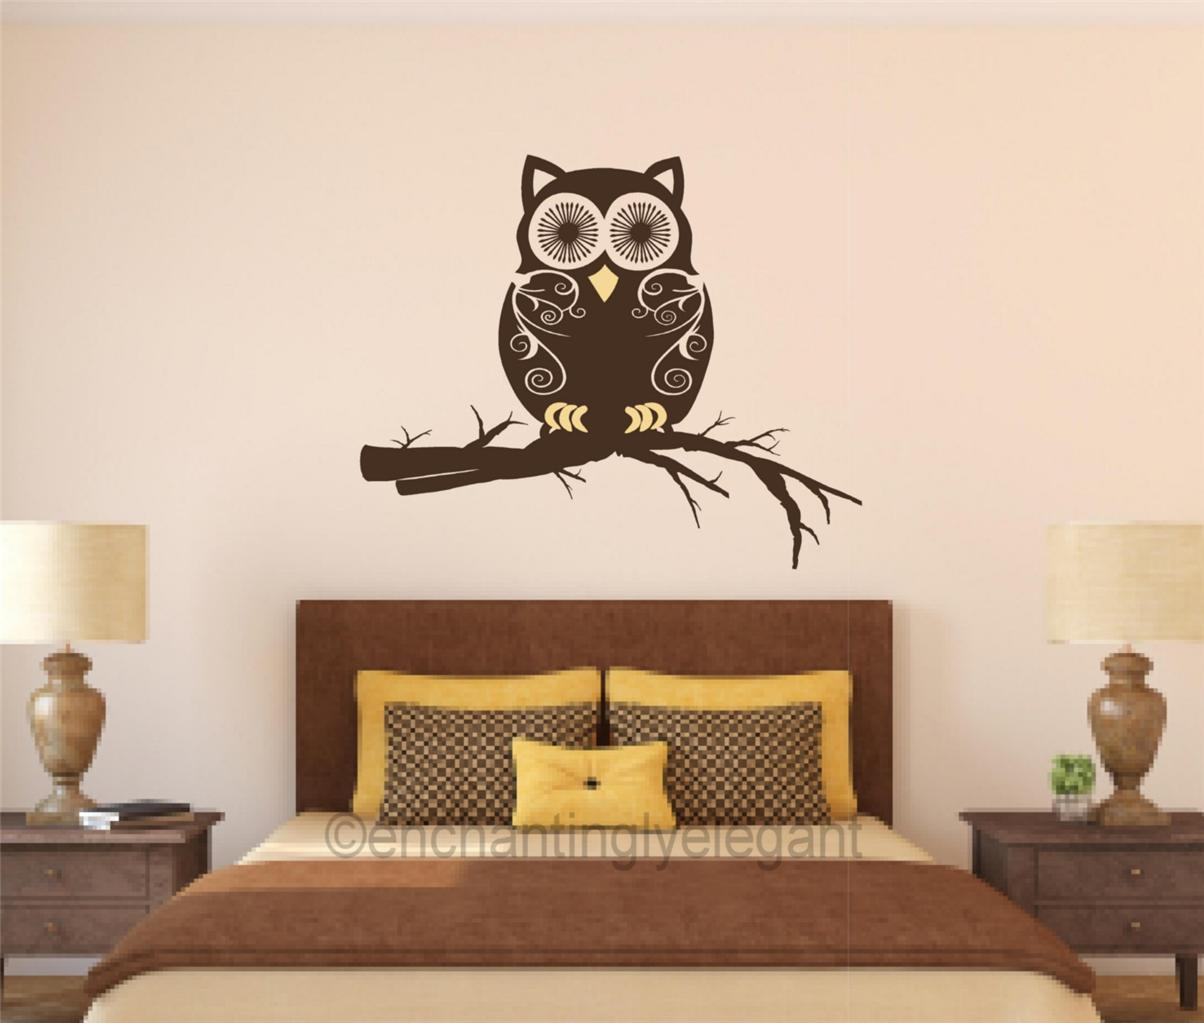 owl on branch vinyl decal wall sticker mural nursery teen room bathroom decor ebay. Black Bedroom Furniture Sets. Home Design Ideas